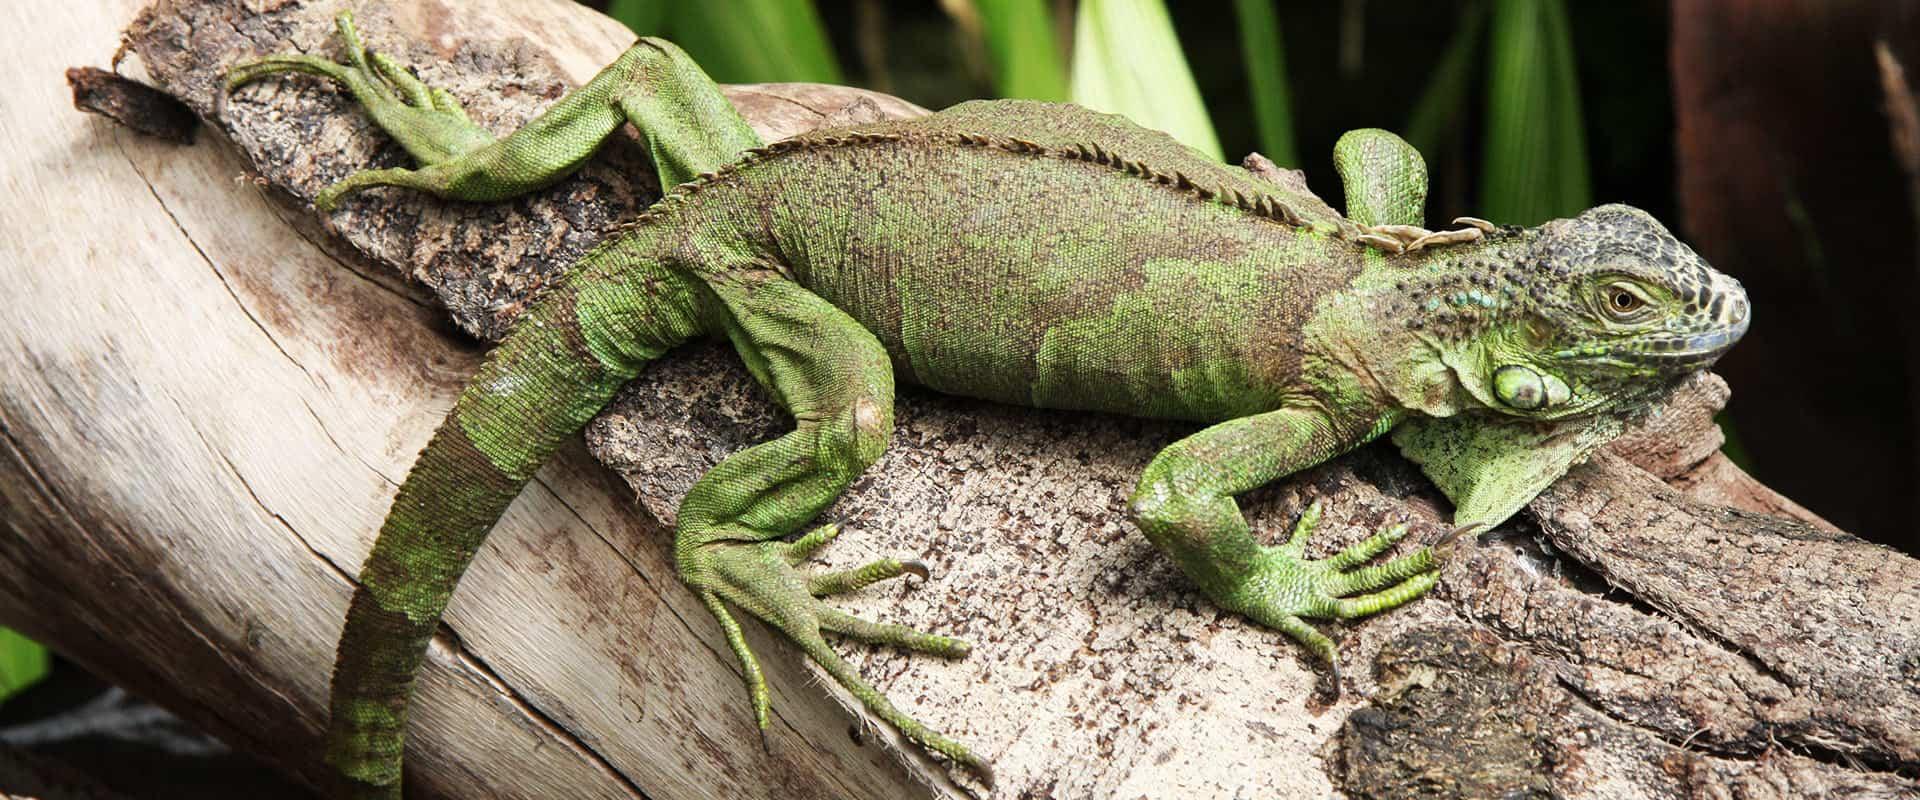 Kapstadt exotisch grünes Tier